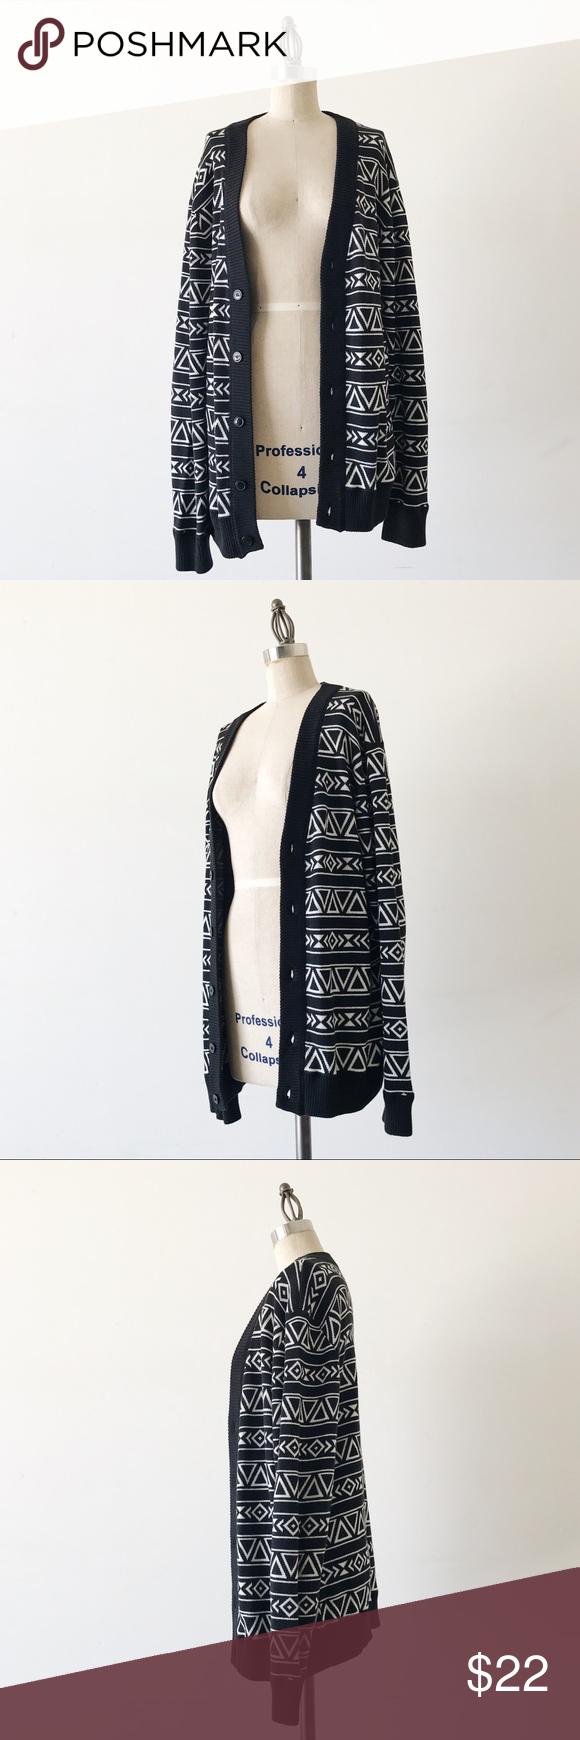 PACSUN | Cotton Boyfriend Cardigan | Sweater cardigan, Sleeve and ...